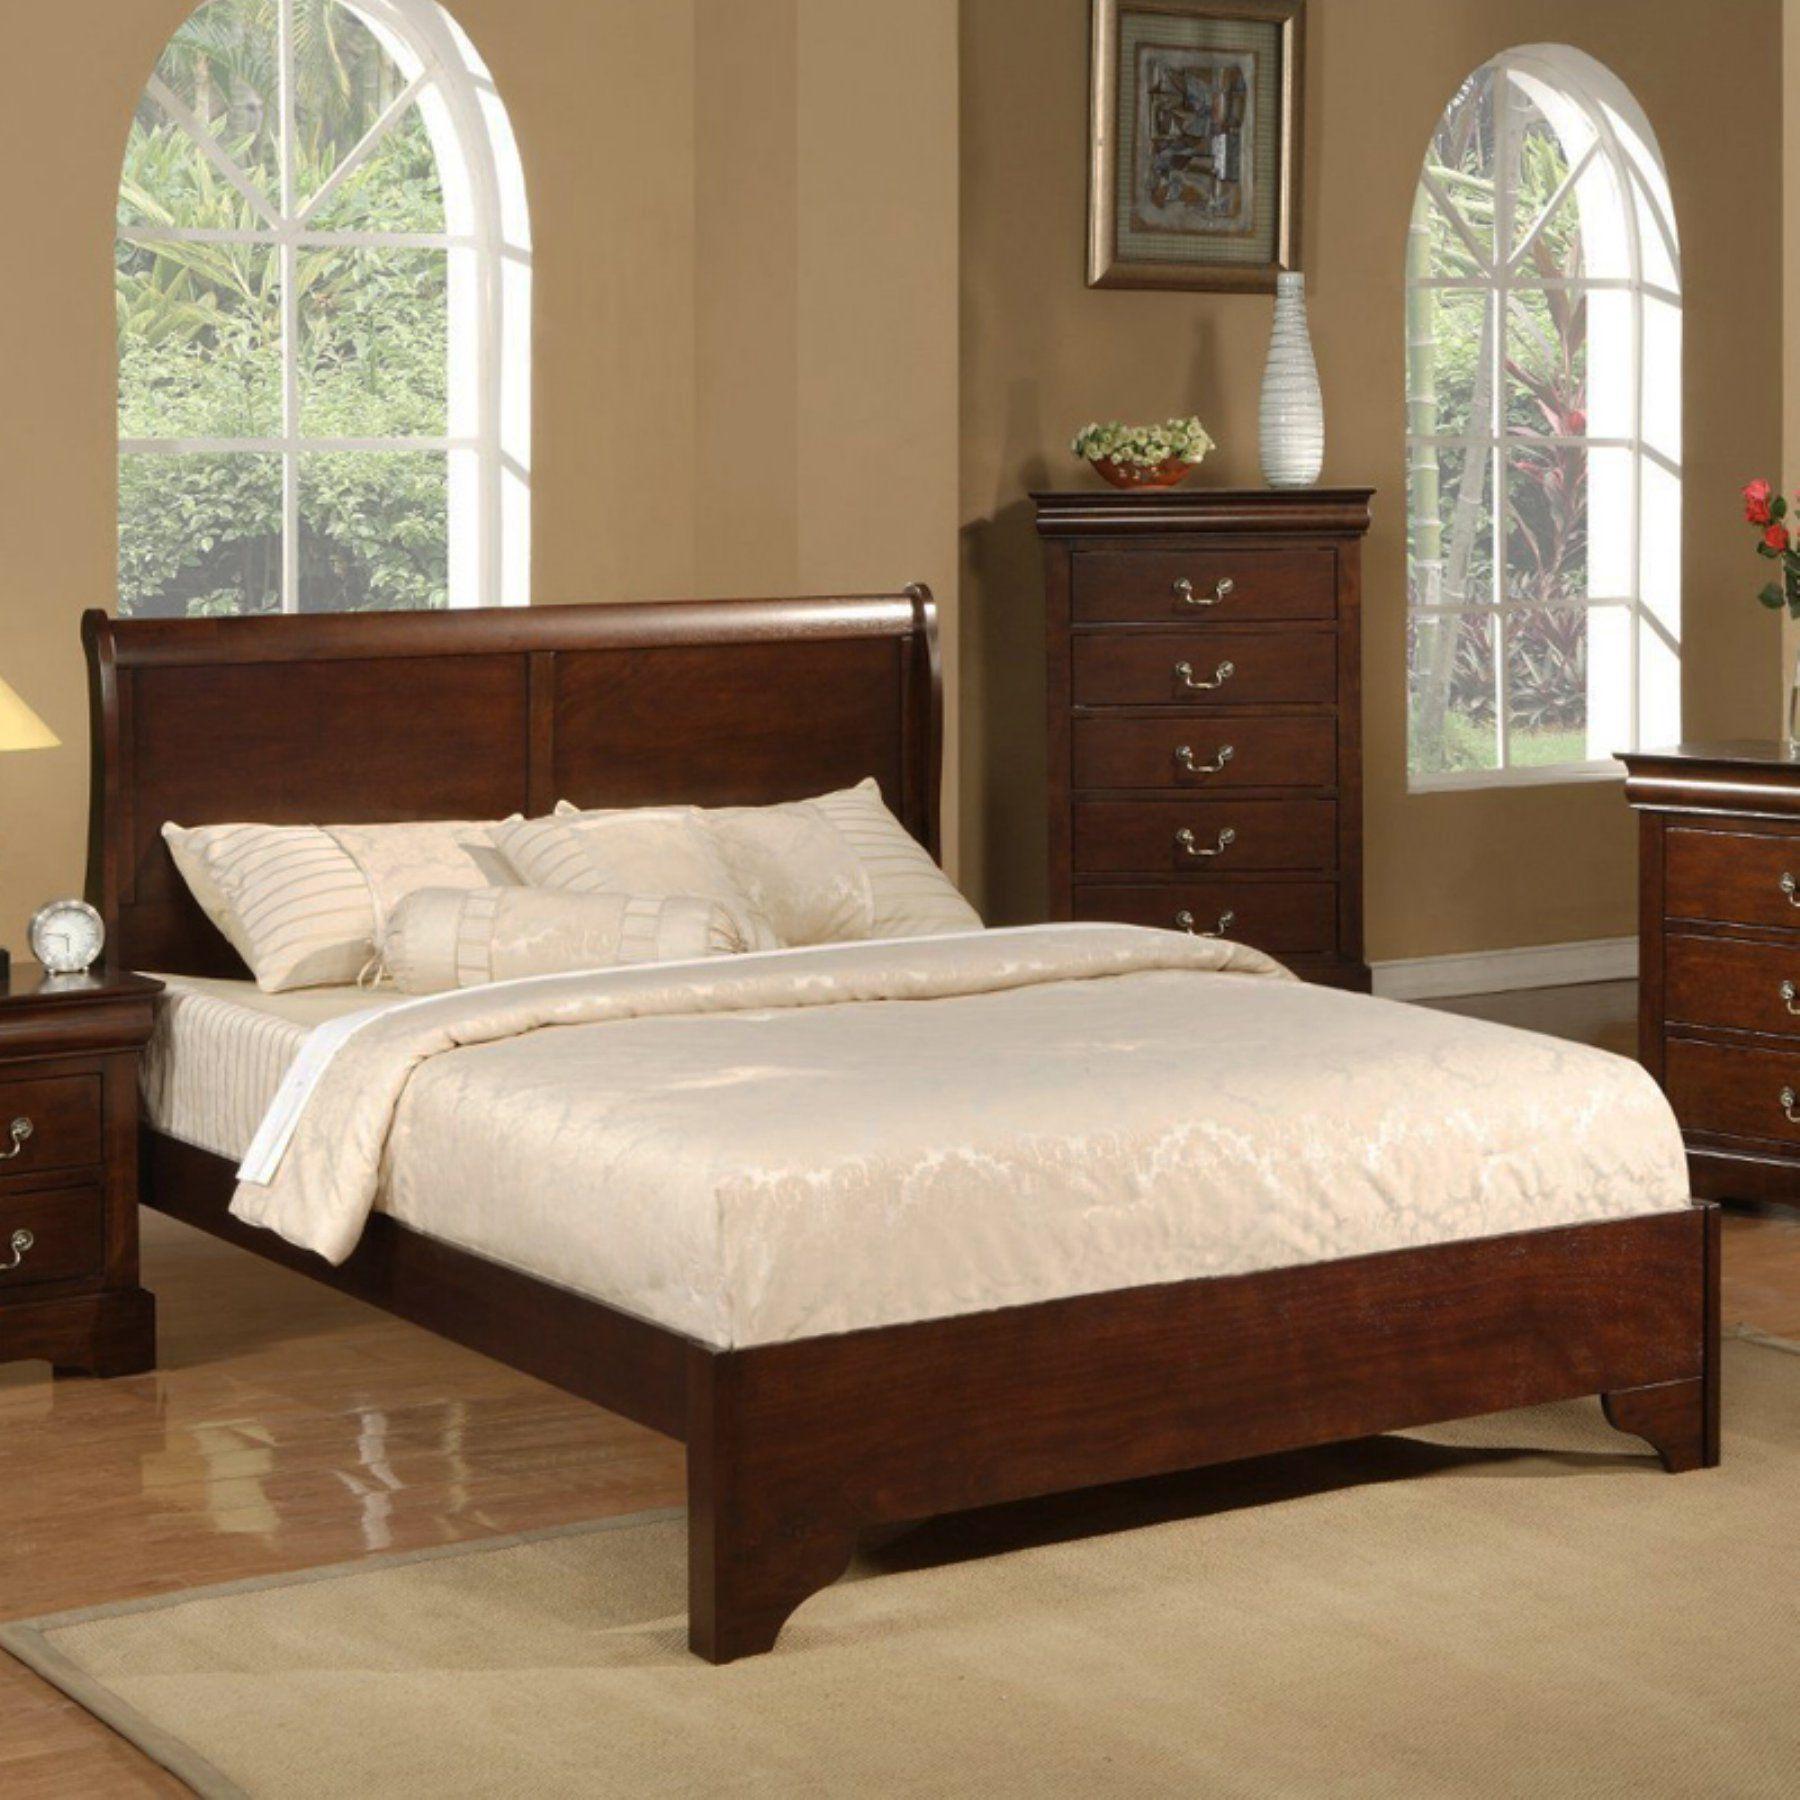 Alpine Furniture West Haven Sleigh Bed Sleigh bedroom